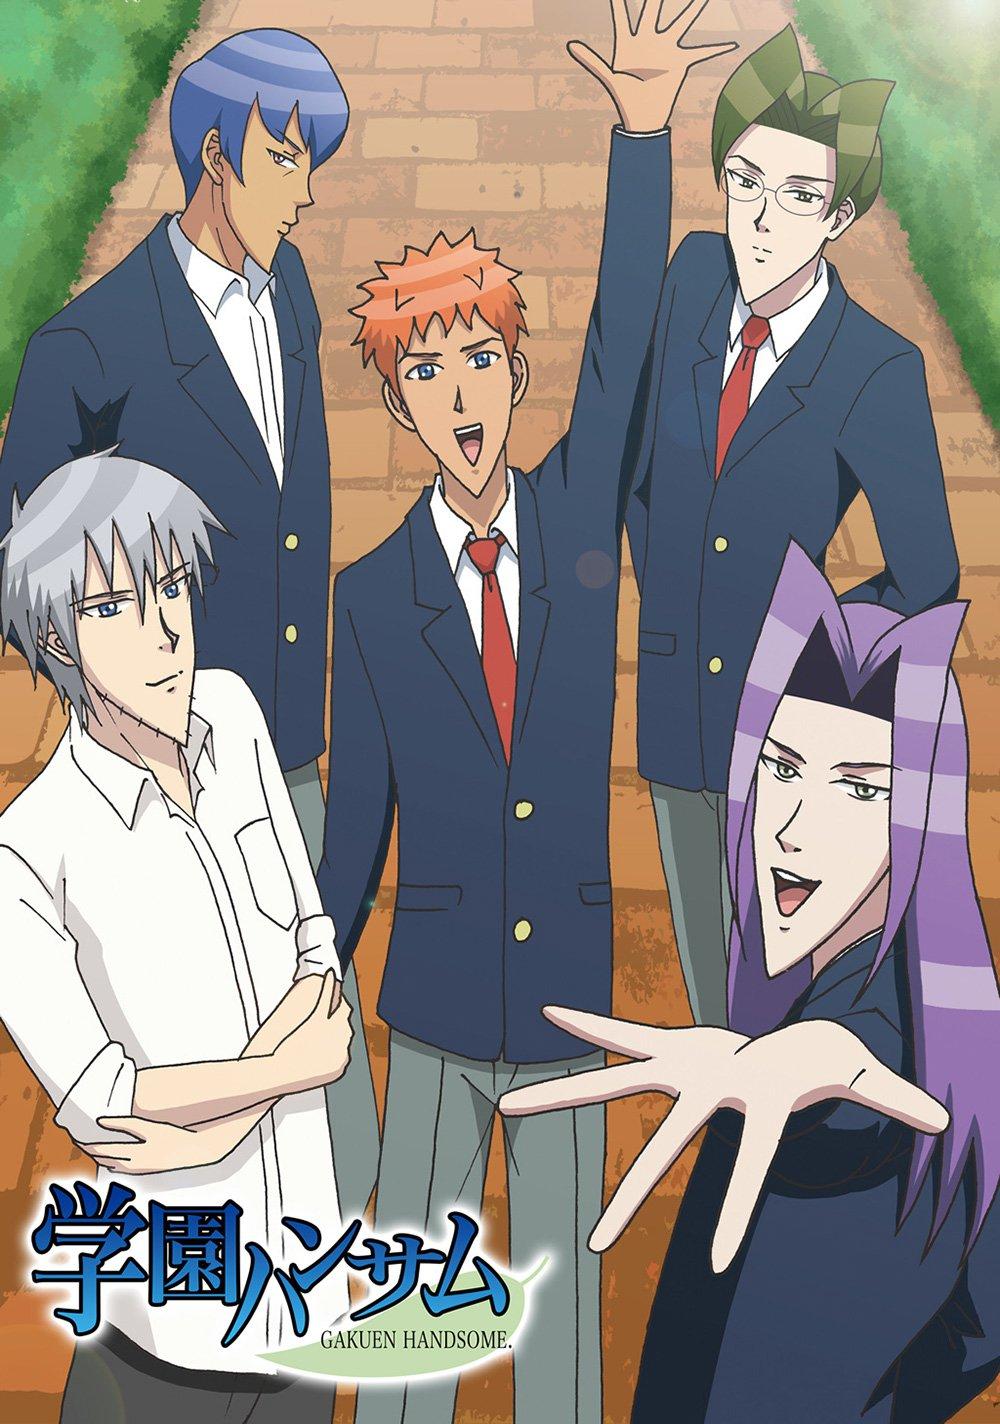 gakuen-handsome-anime-visual